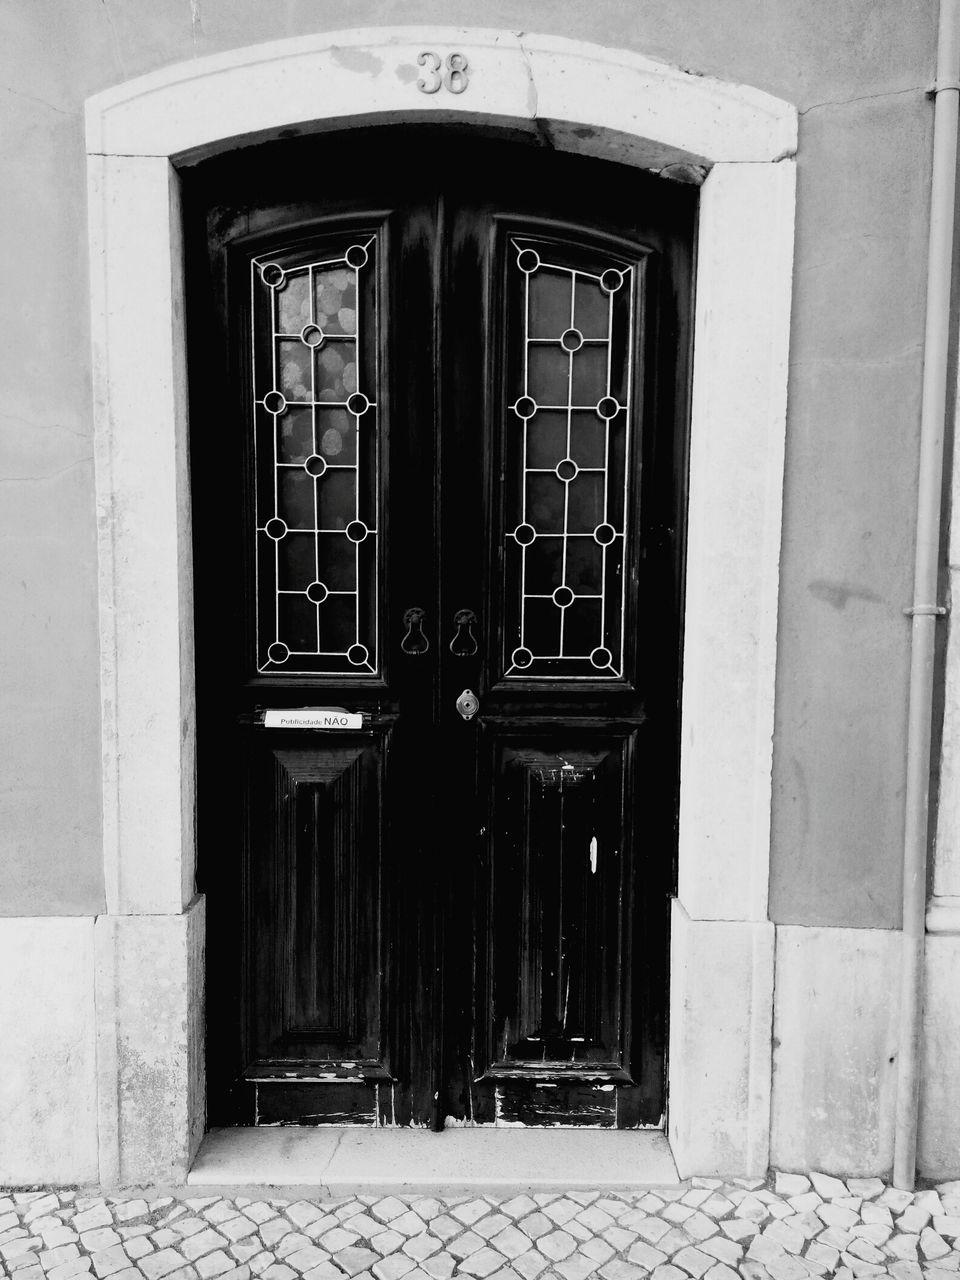 door, closed, entrance, no people, outdoors, architecture, built structure, day, building exterior, doorway, entry, open door, close-up